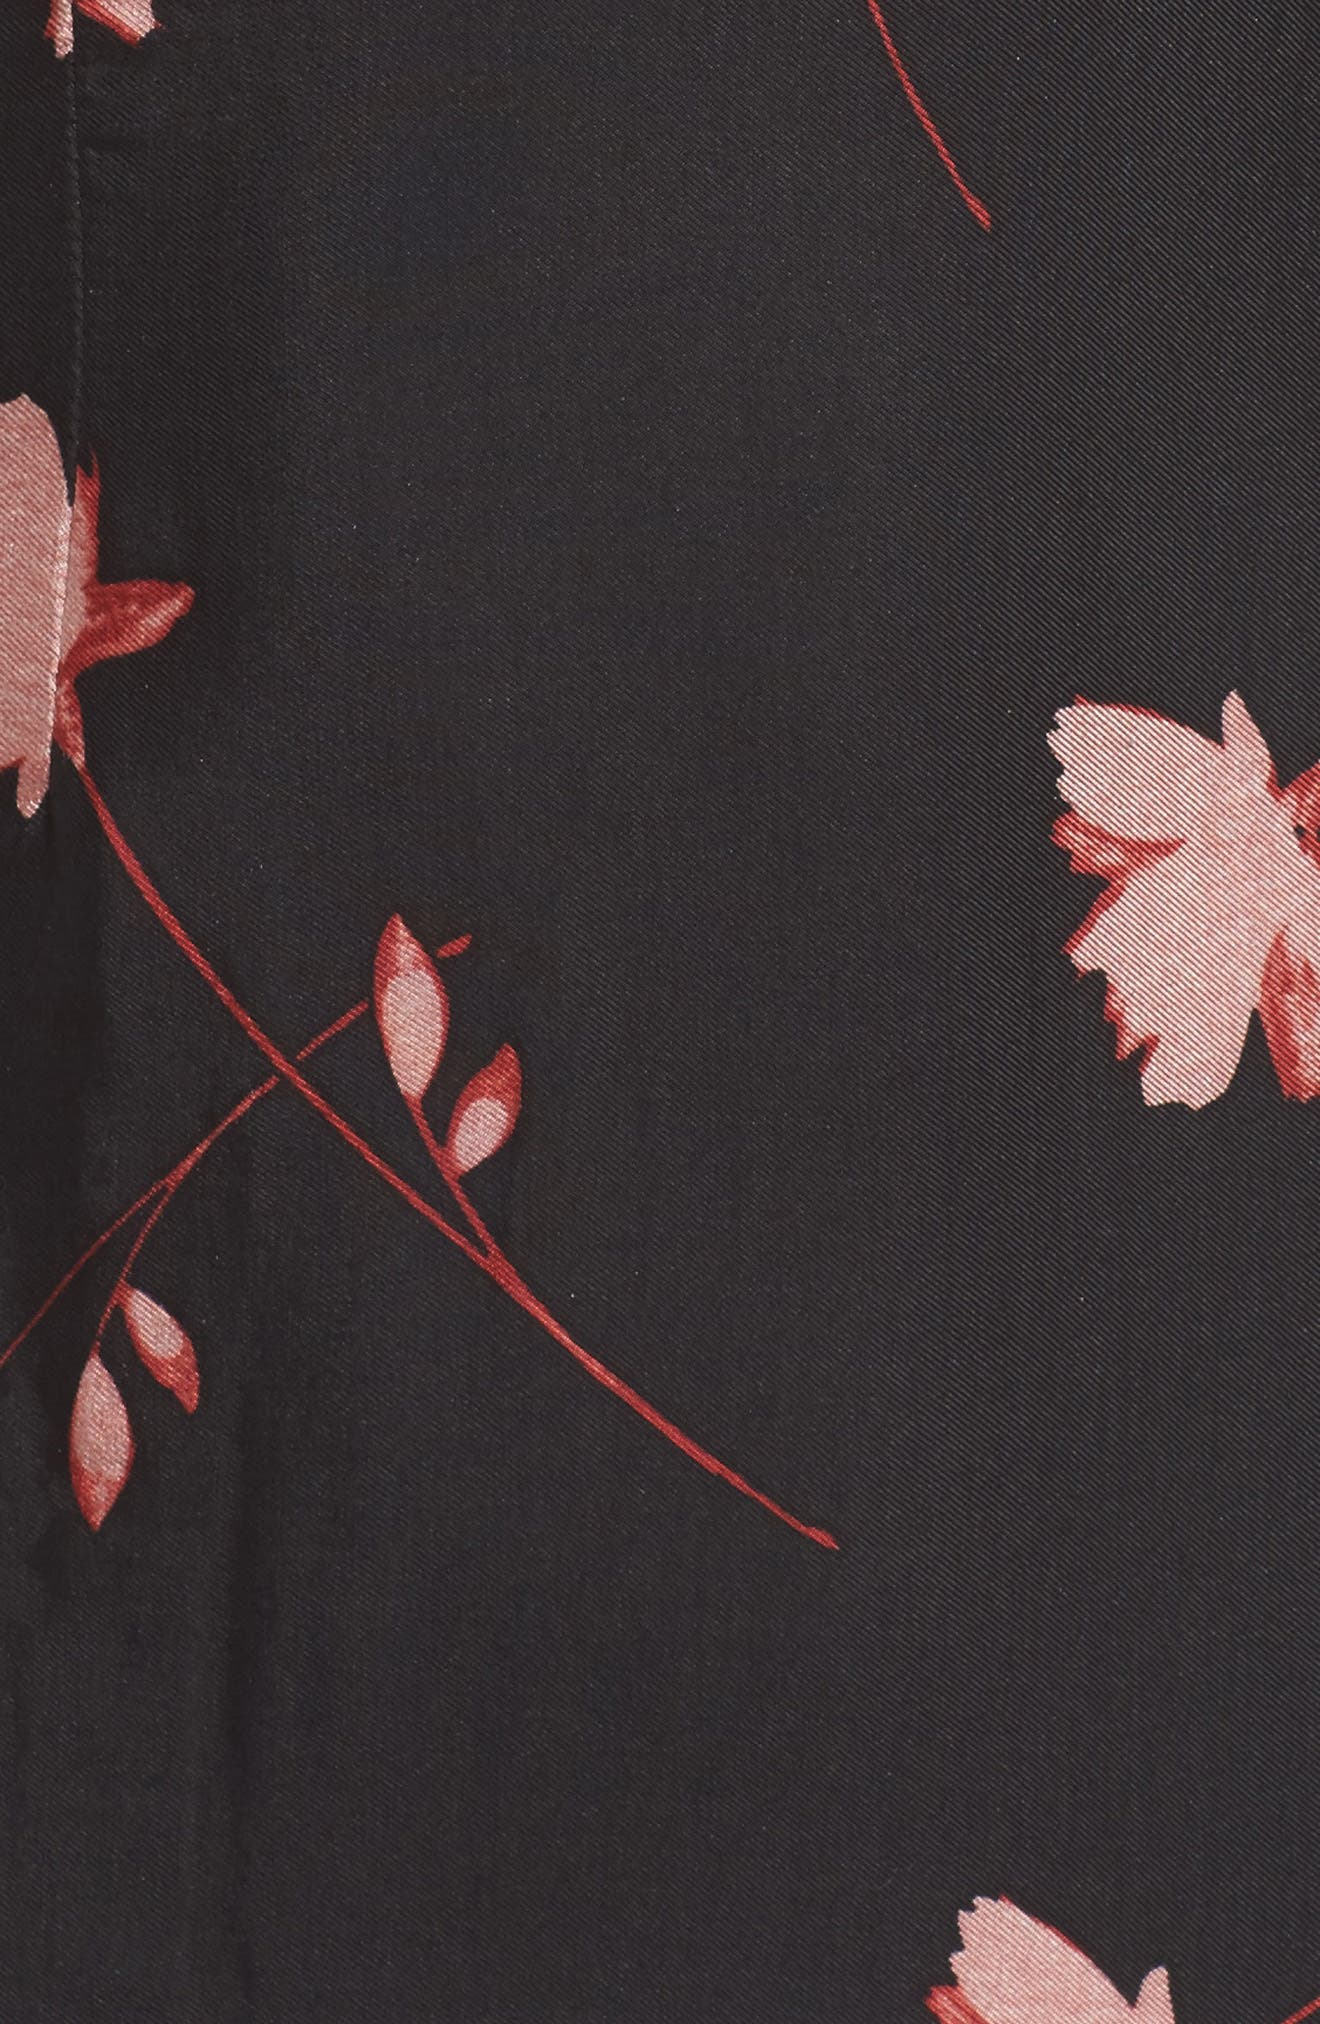 Lucia Frill One-Shoulder Dress,                             Alternate thumbnail 5, color,                             017